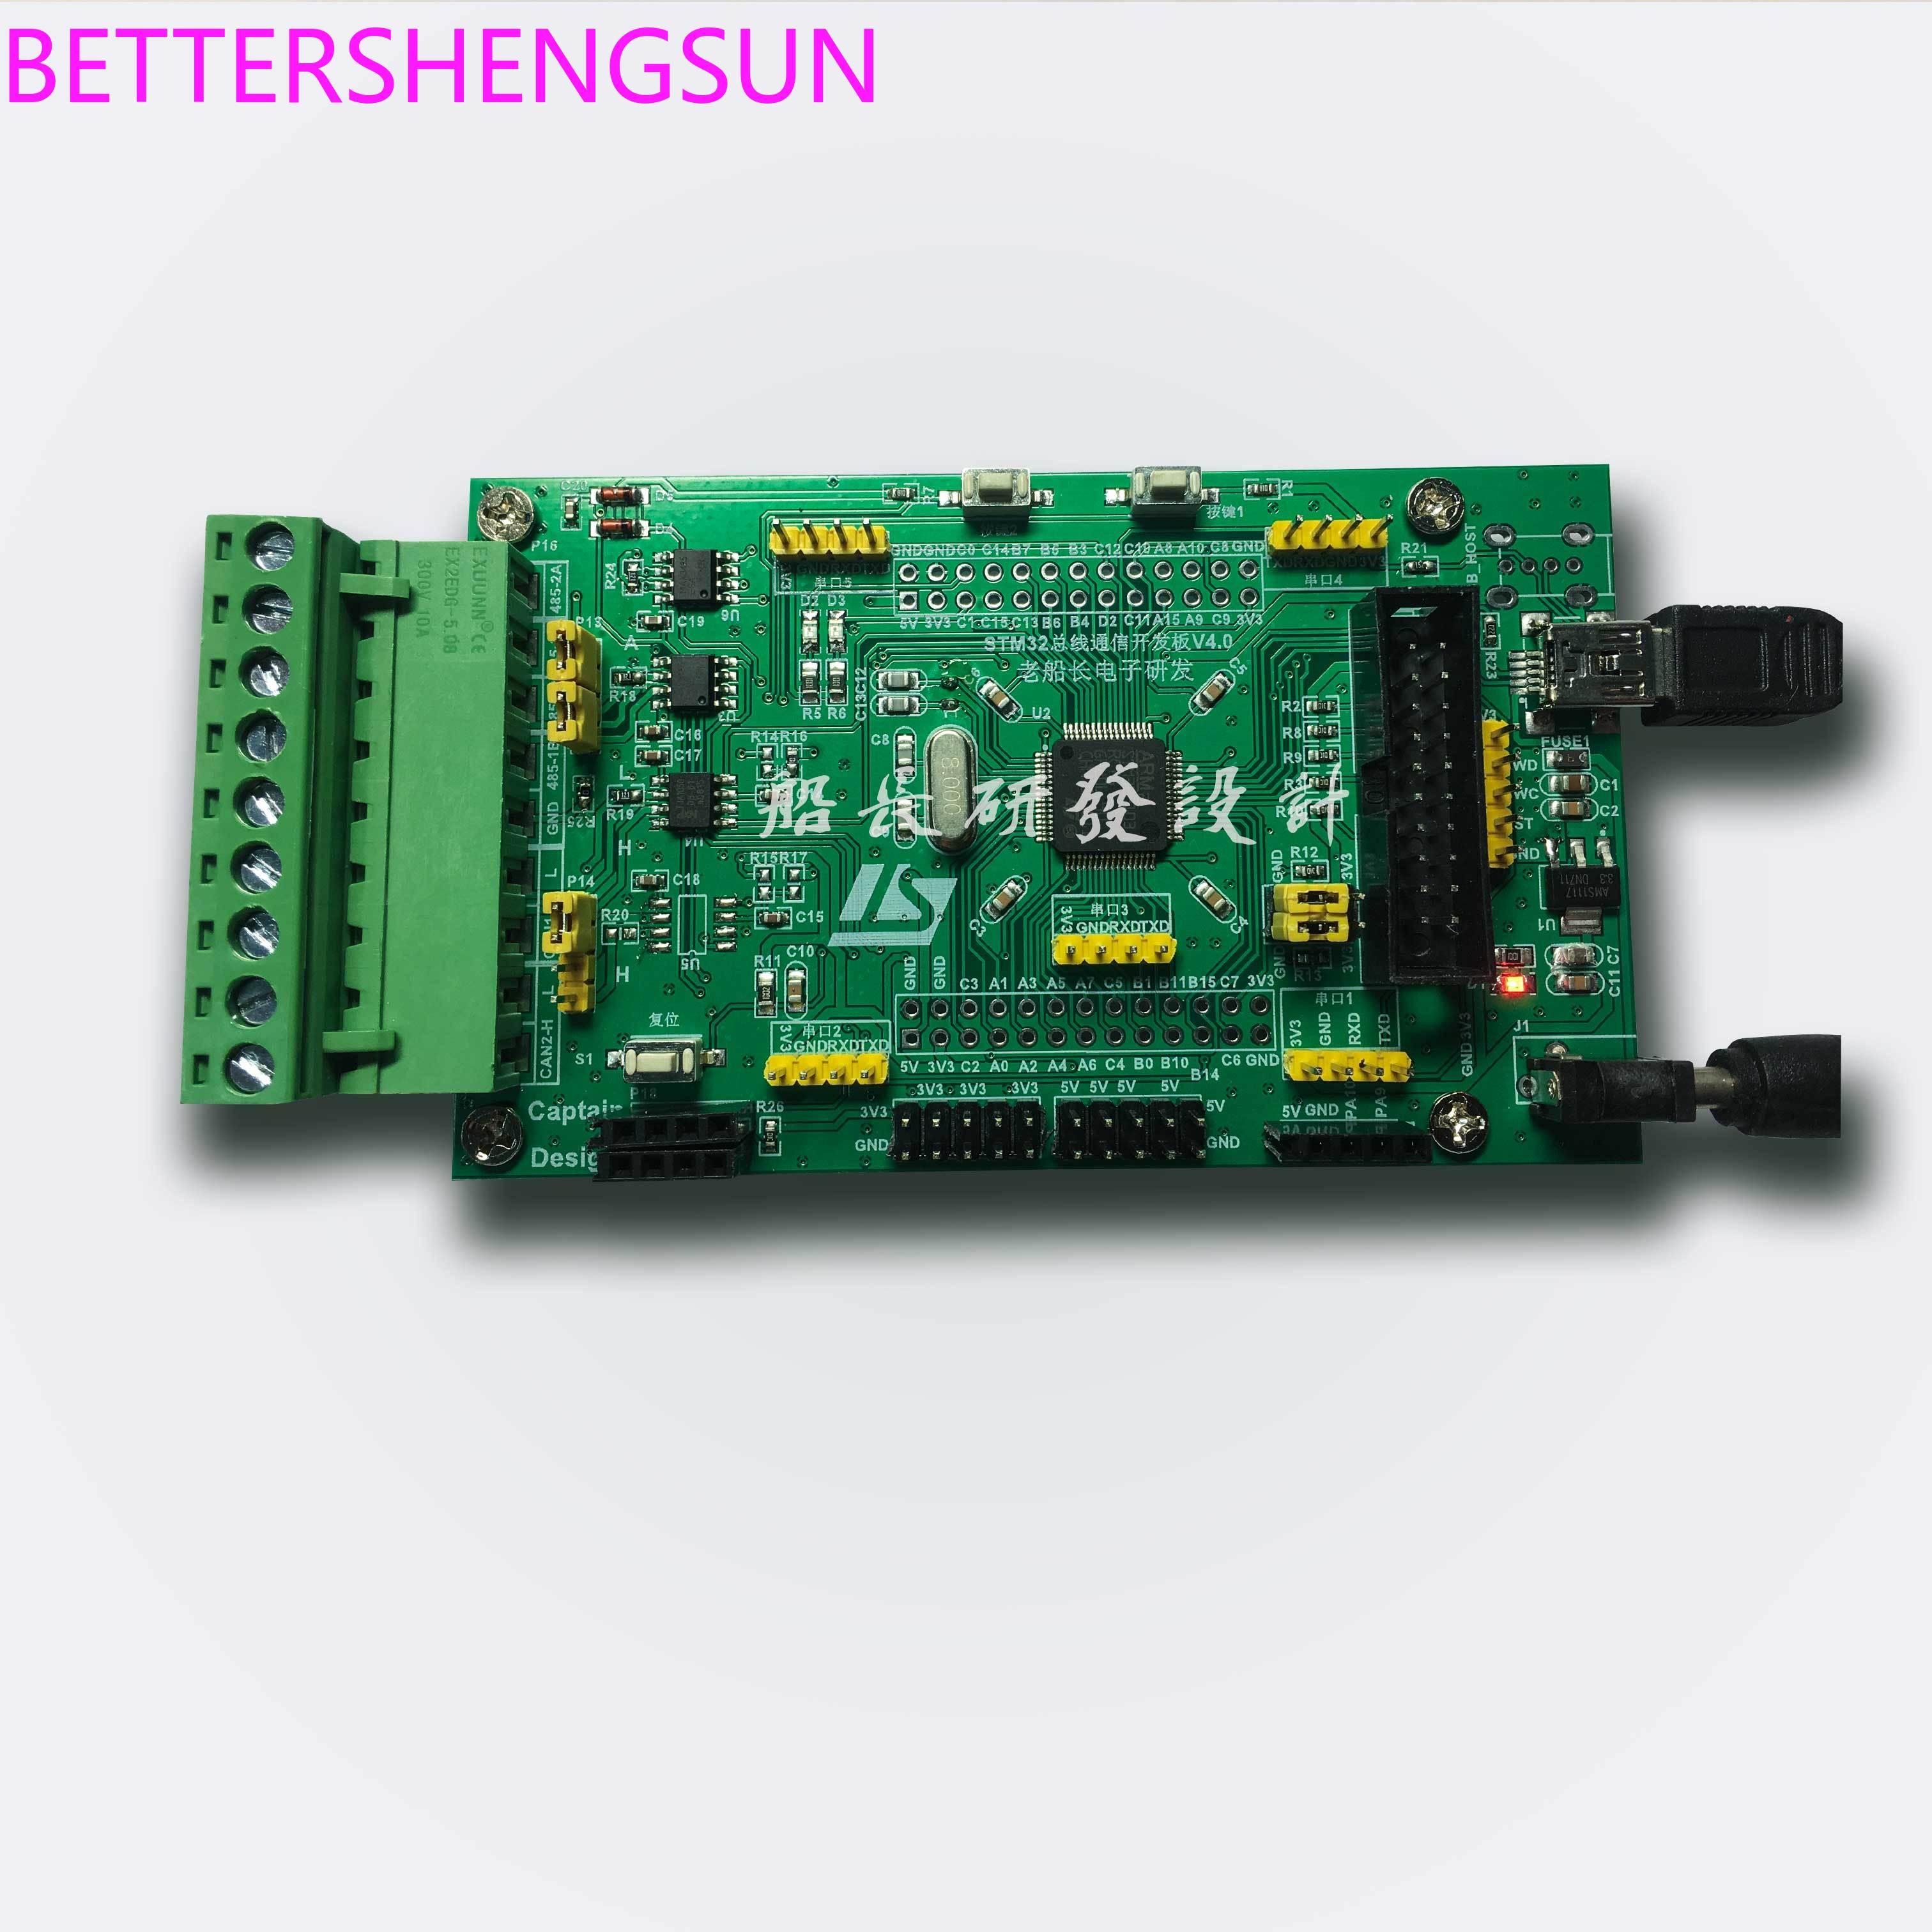 STM32F103RCT6 Placa de desarrollo de bus CAN Dual 485 2 vías MODBUS